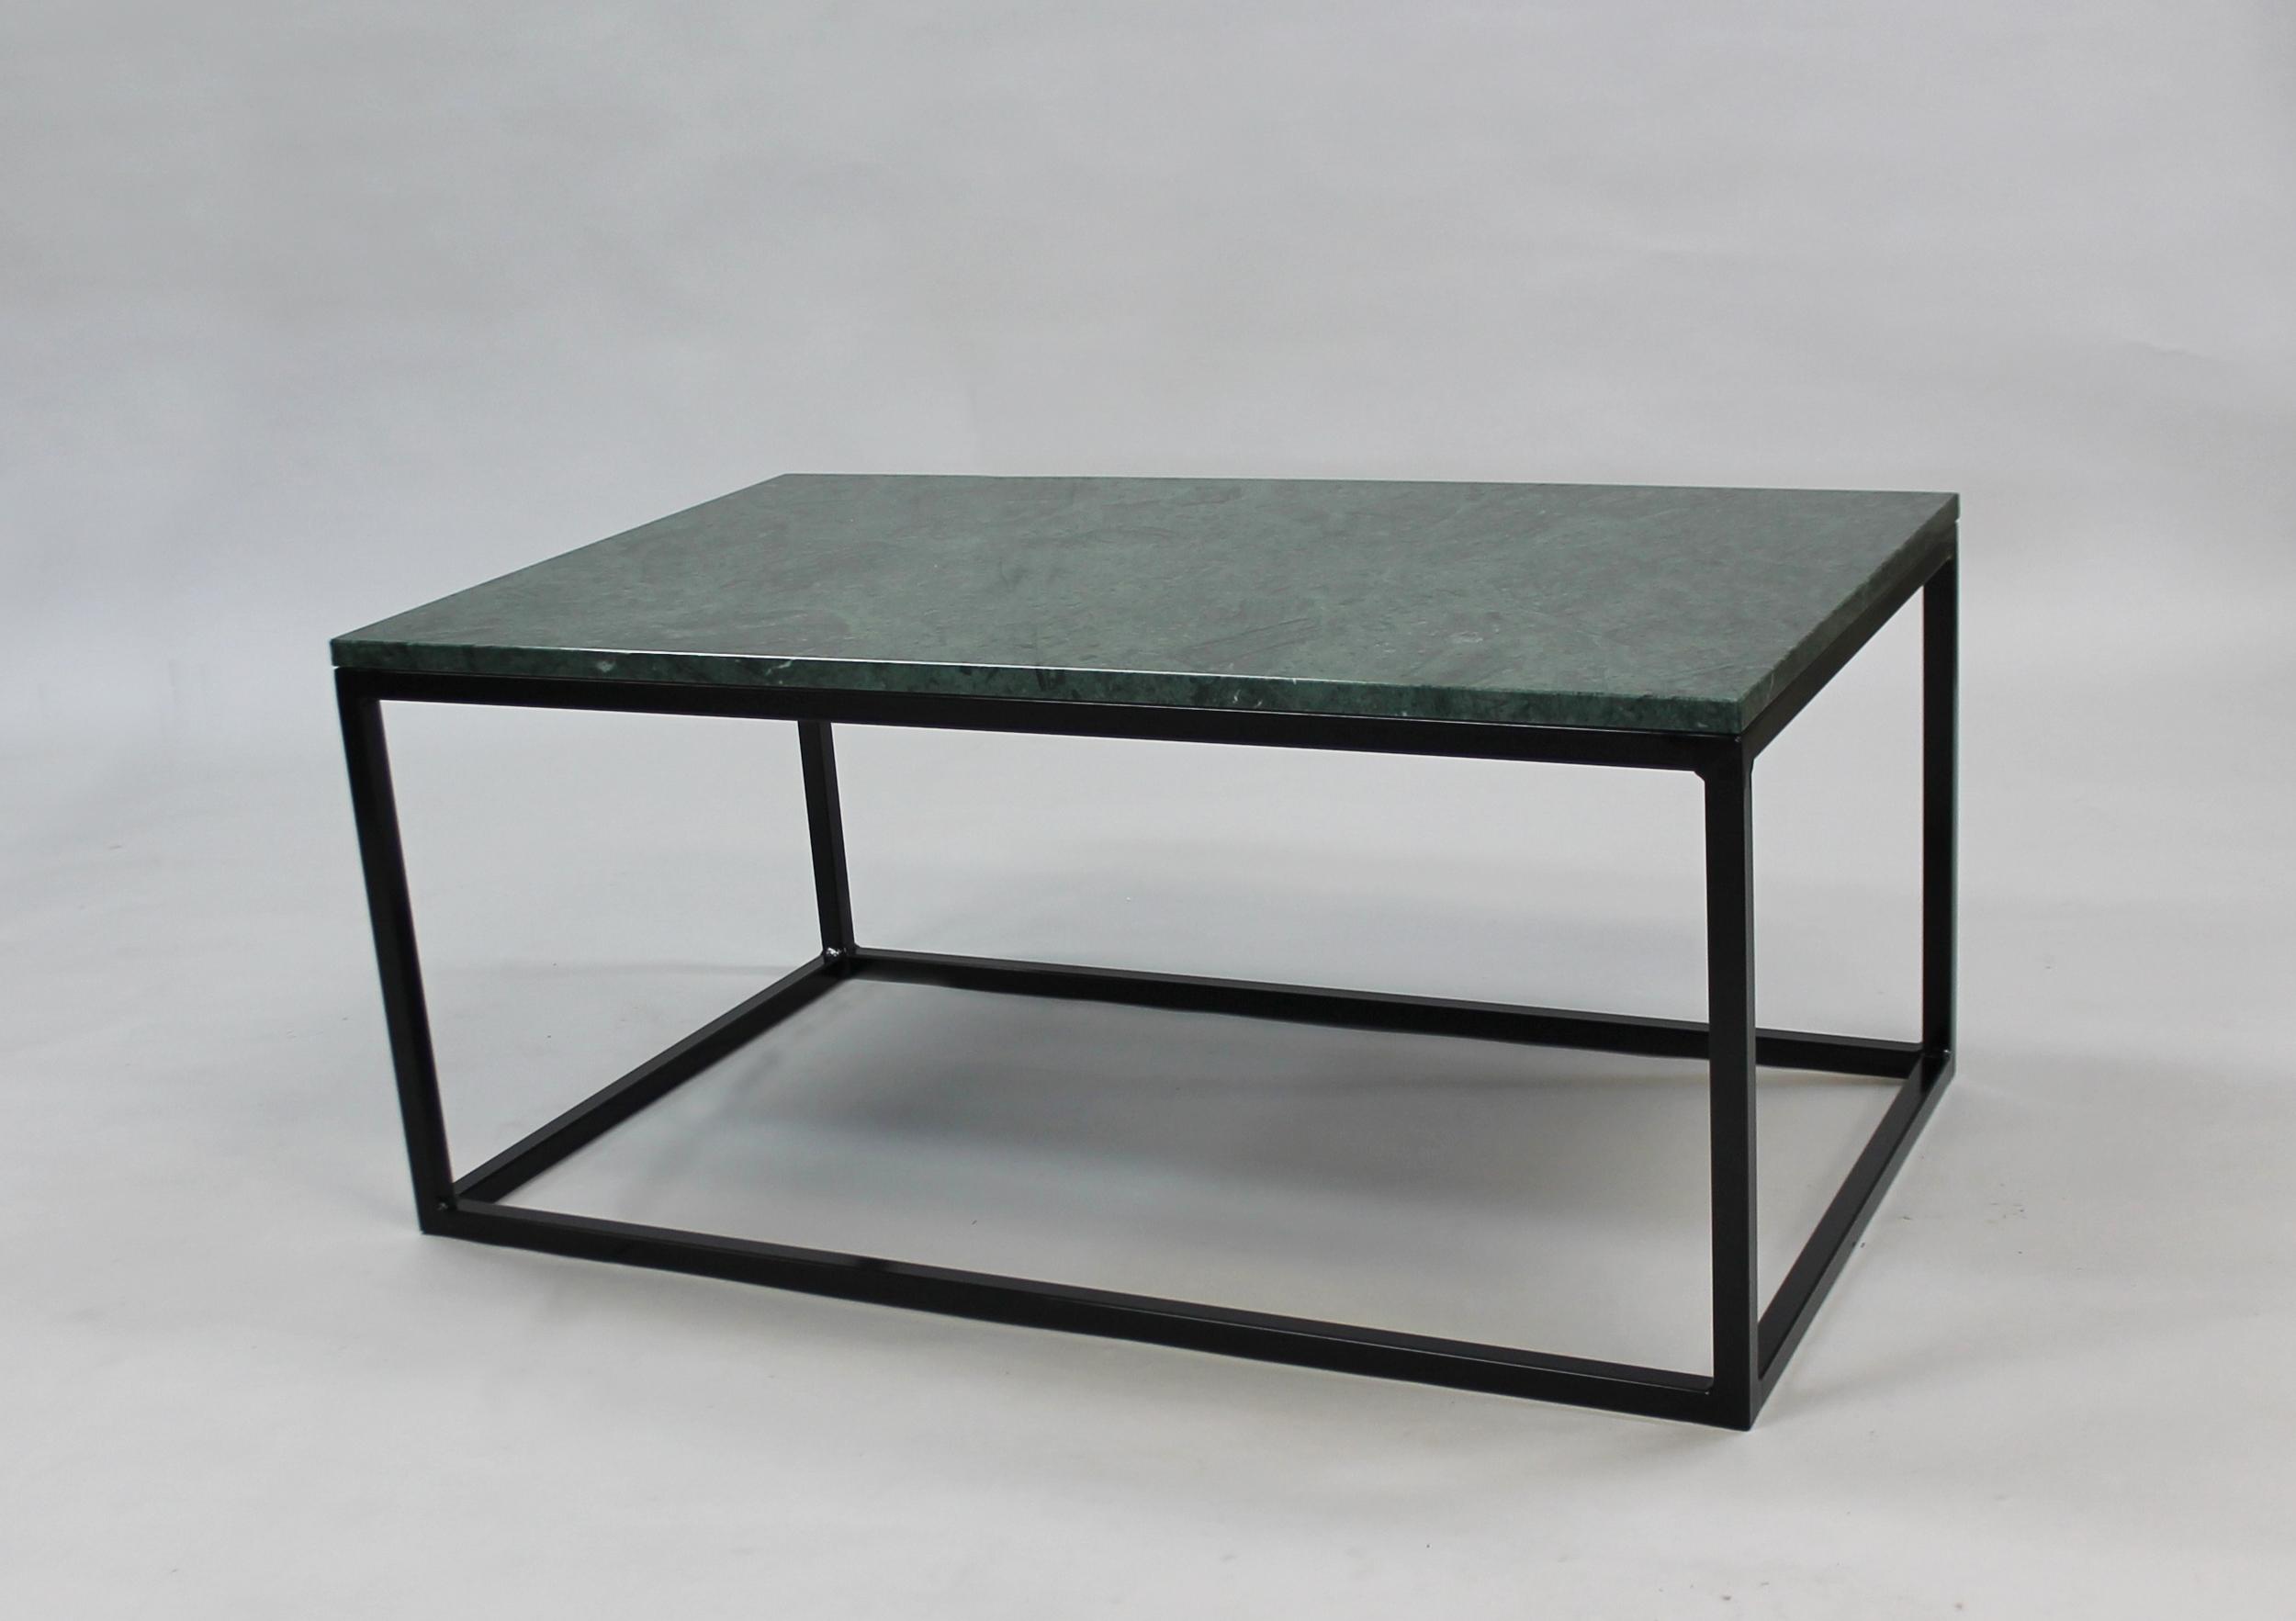 Marmorbord, grön  - 100x60 x  45  cm, svart underrede kub  Pris 6 000 :-  inkl frakt  Pris nu 4000:- inkl frakt    Finns även i 120x60 cm -   pris 7 000:- inkl frakt   Pris nu 4500:- inkl frakt